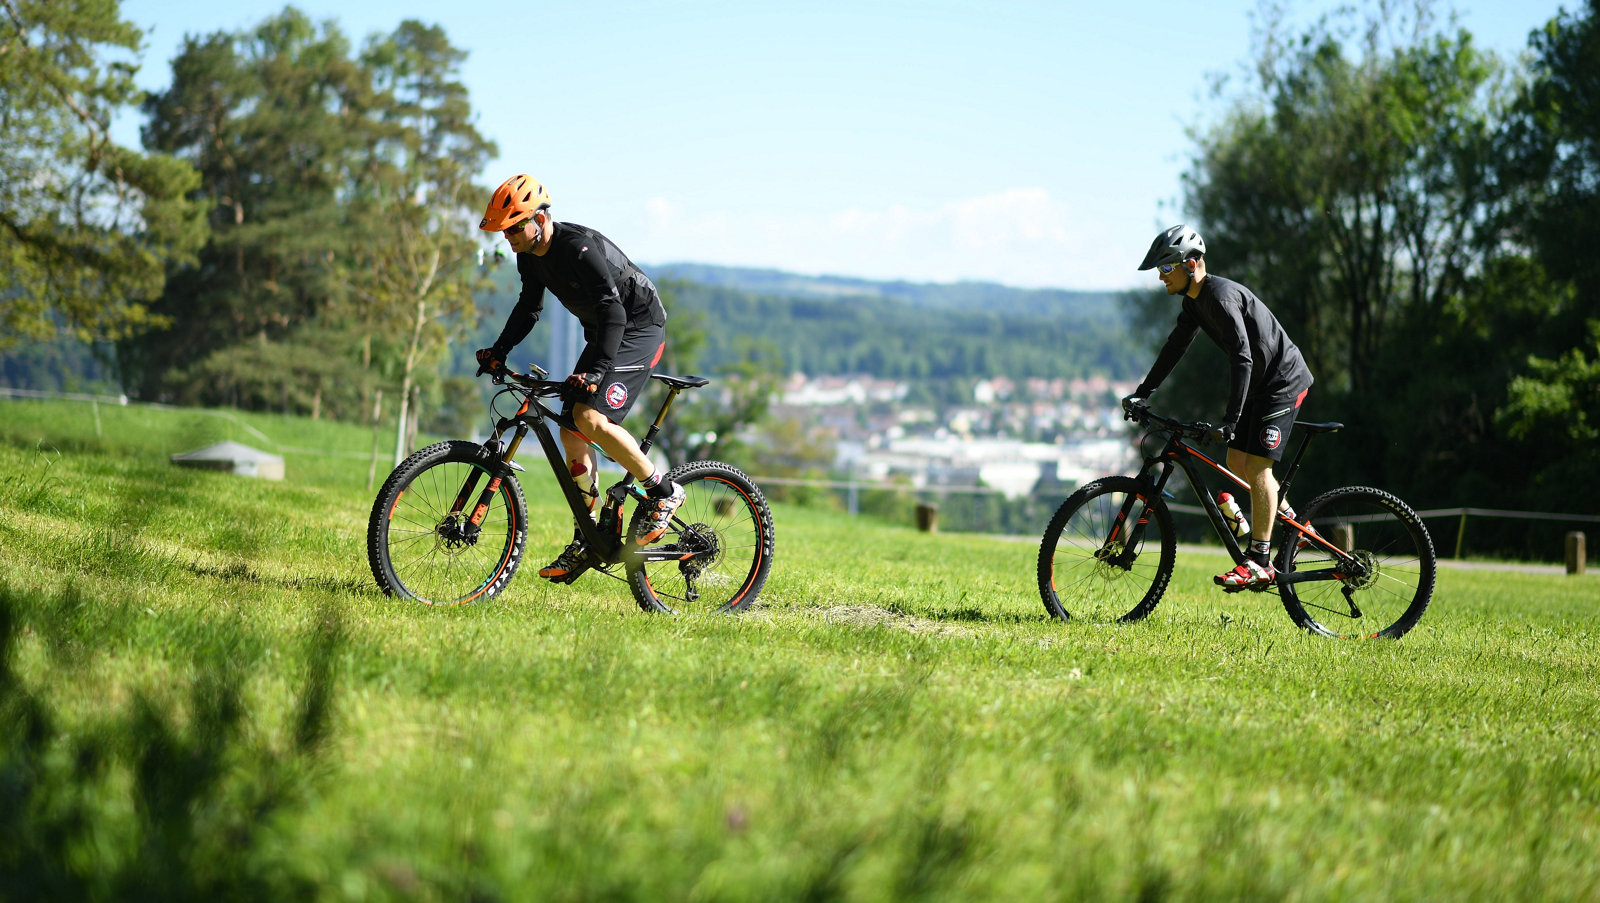 bike-wettbewerb-sport-wiese.jpg